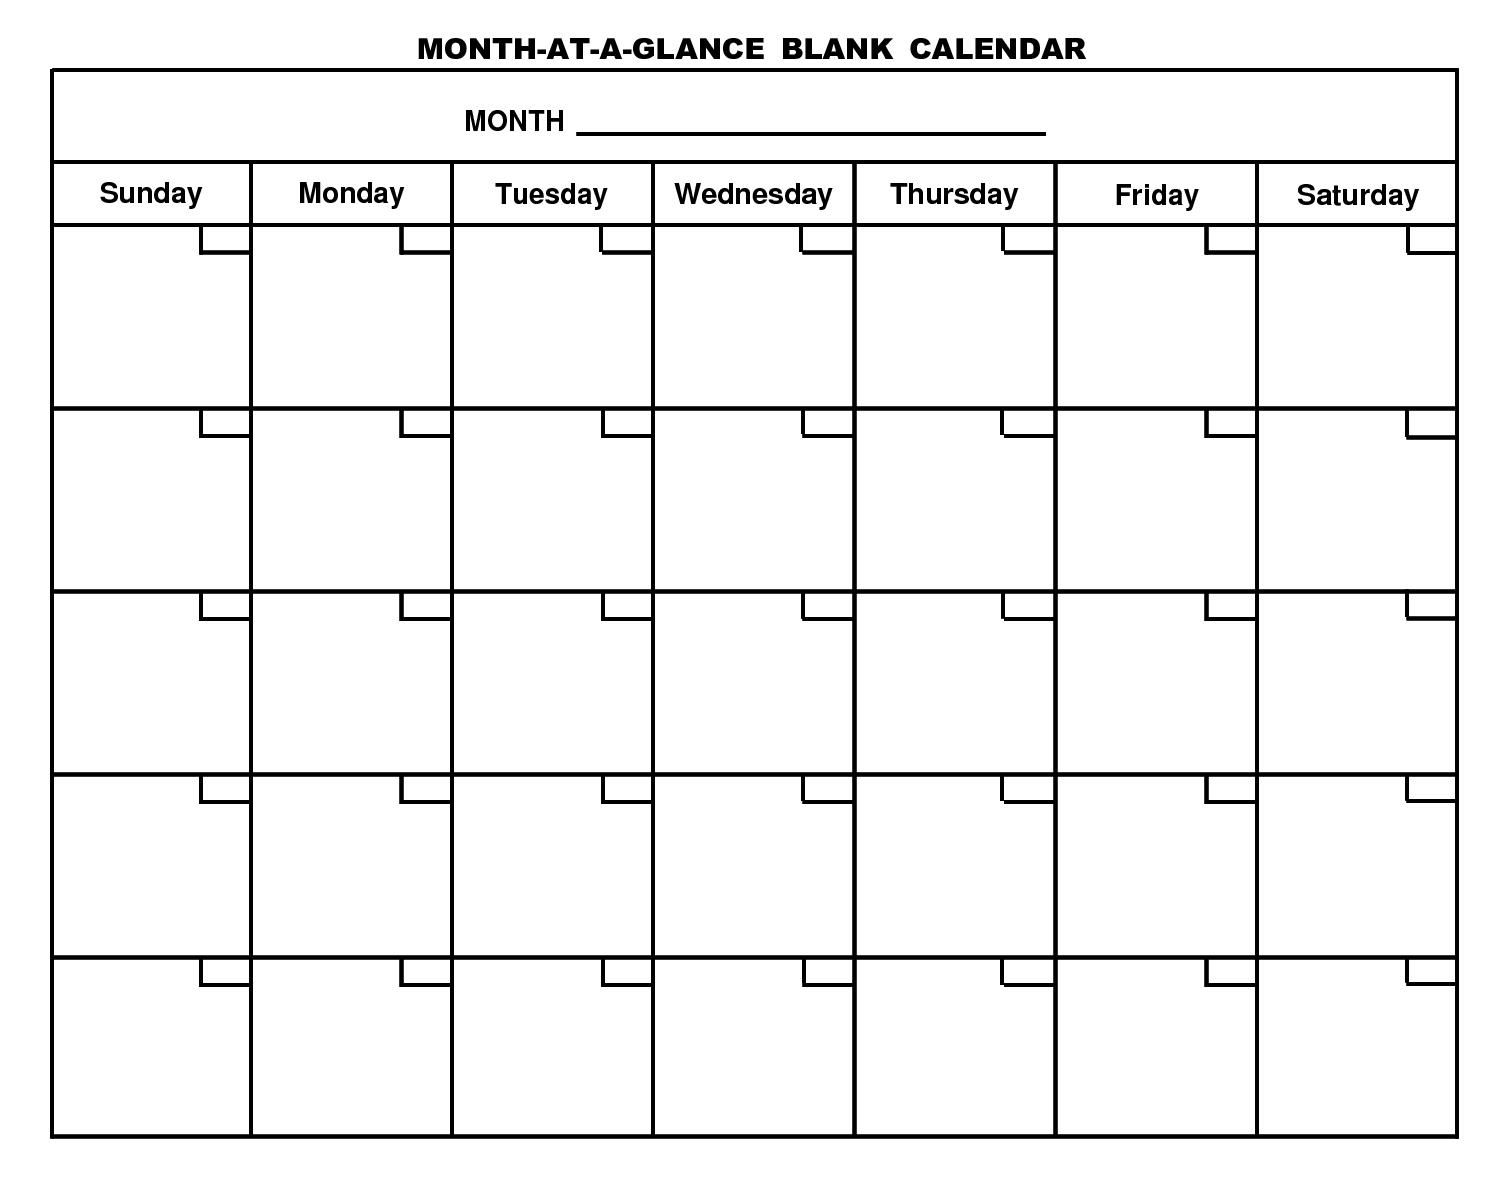 Printable Blank Monthly Calendar | Blank Calendar Pages